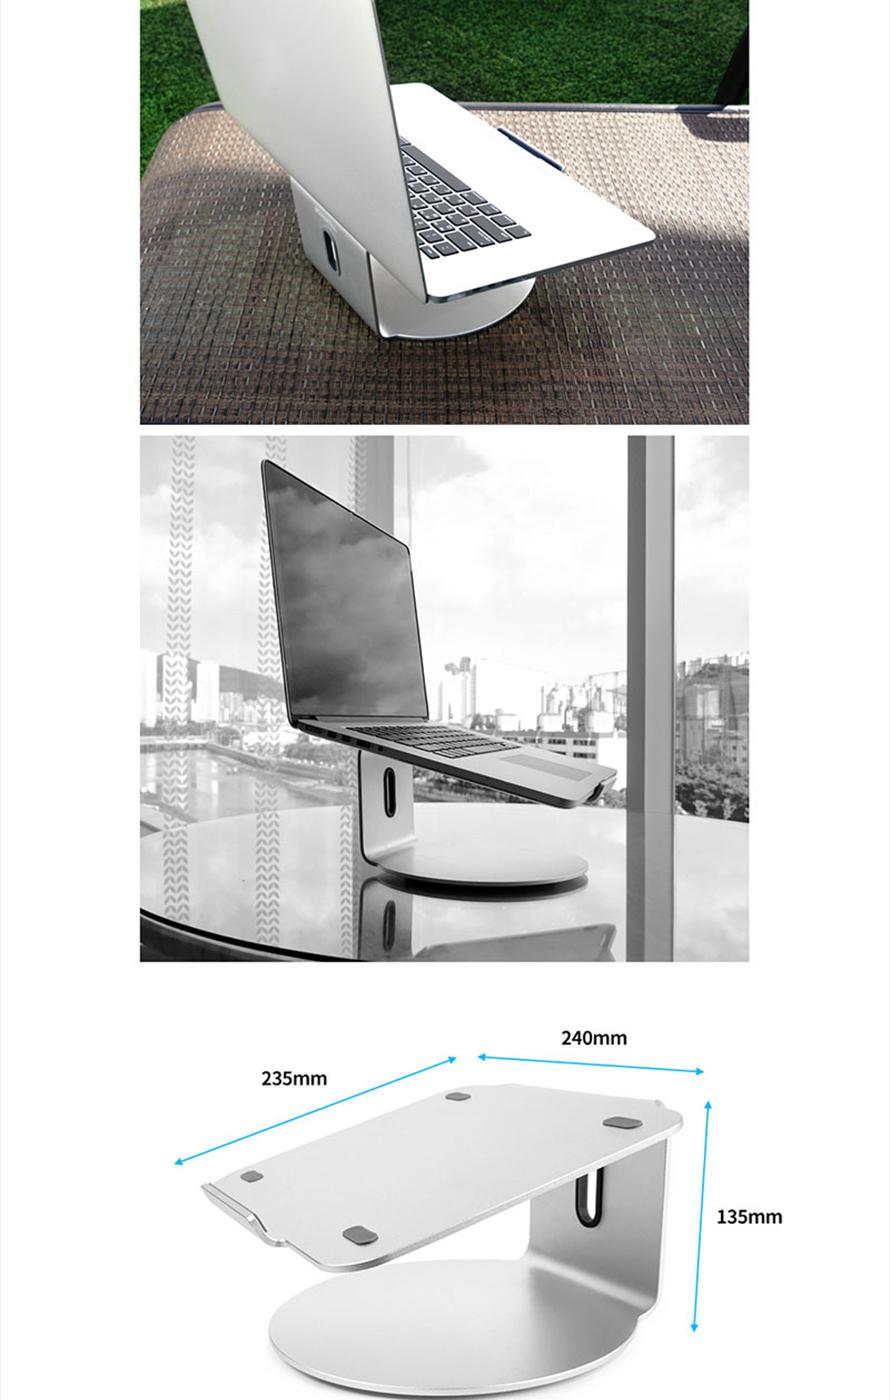 MAXTILL OFFI NT-200 노트북 알루미늄 스탠드